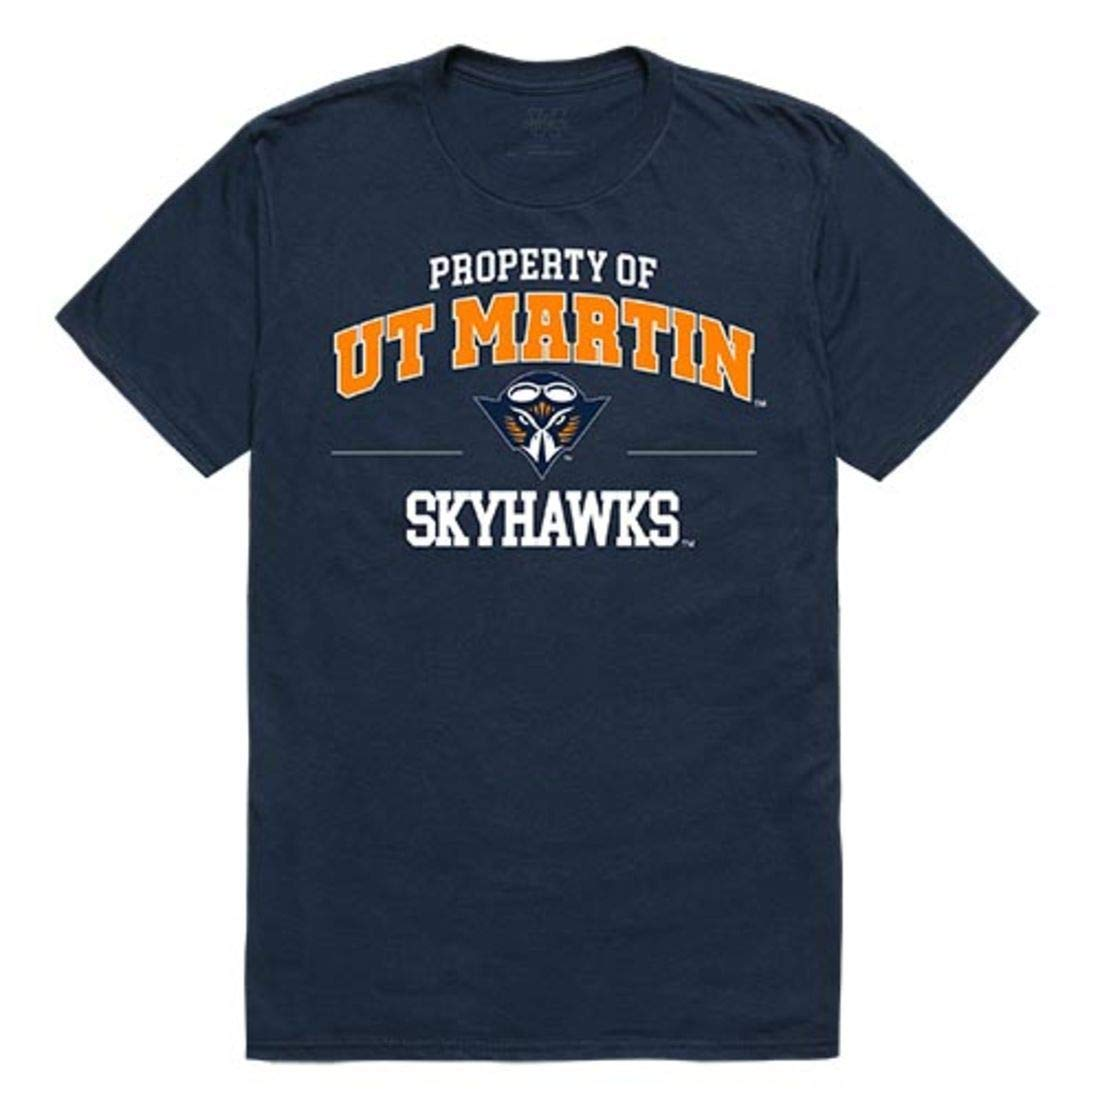 Utm University Of Tennessee At Martin Skyhawks Property Tee T Shirt Navy